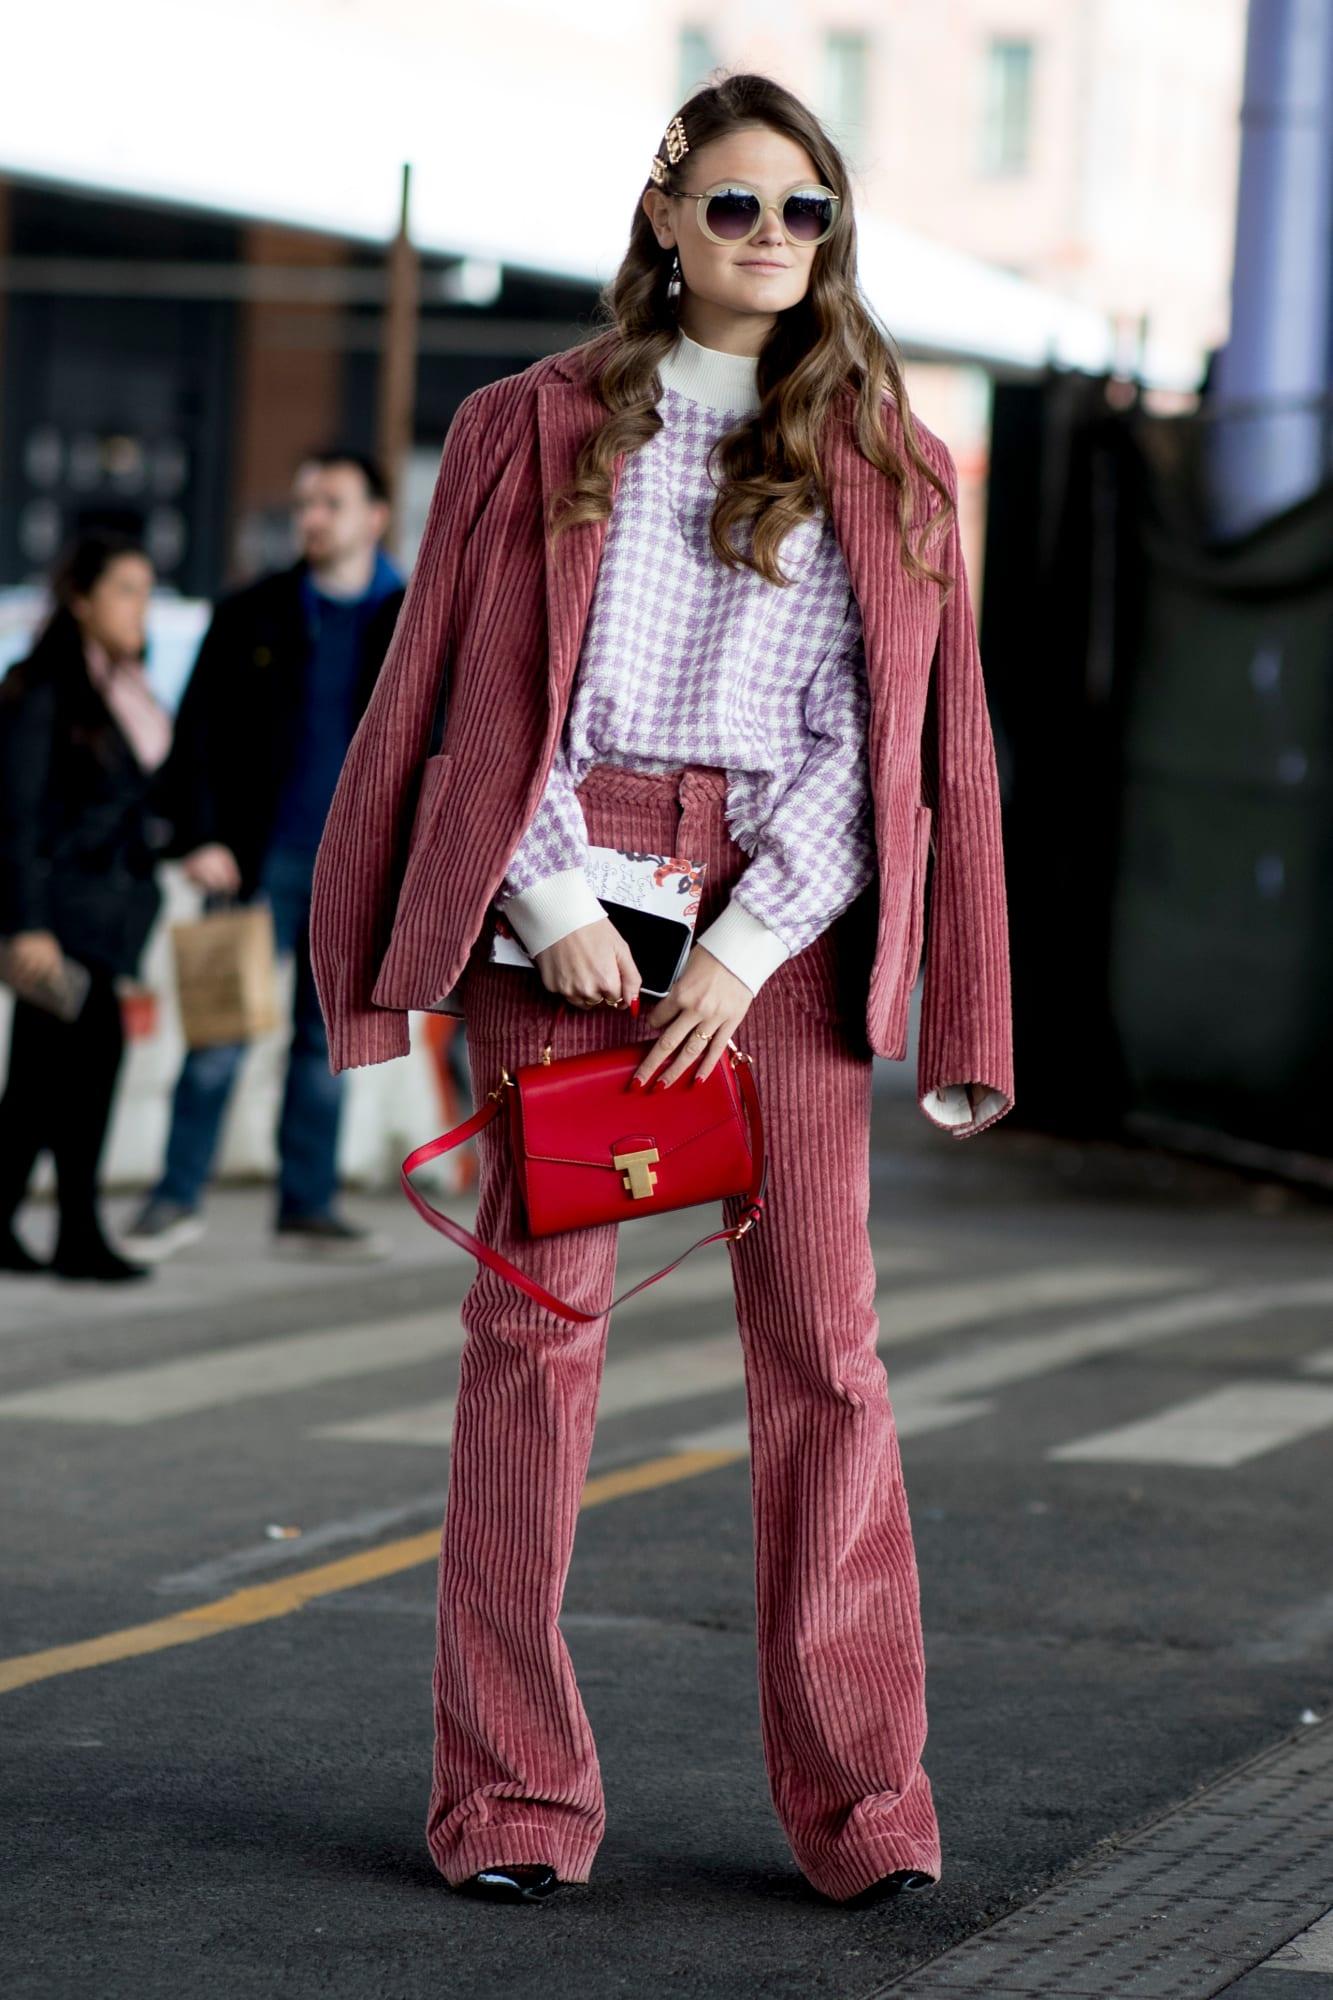 new-york-fashion-week-street-style-fall-2019-day-4-35.jpg